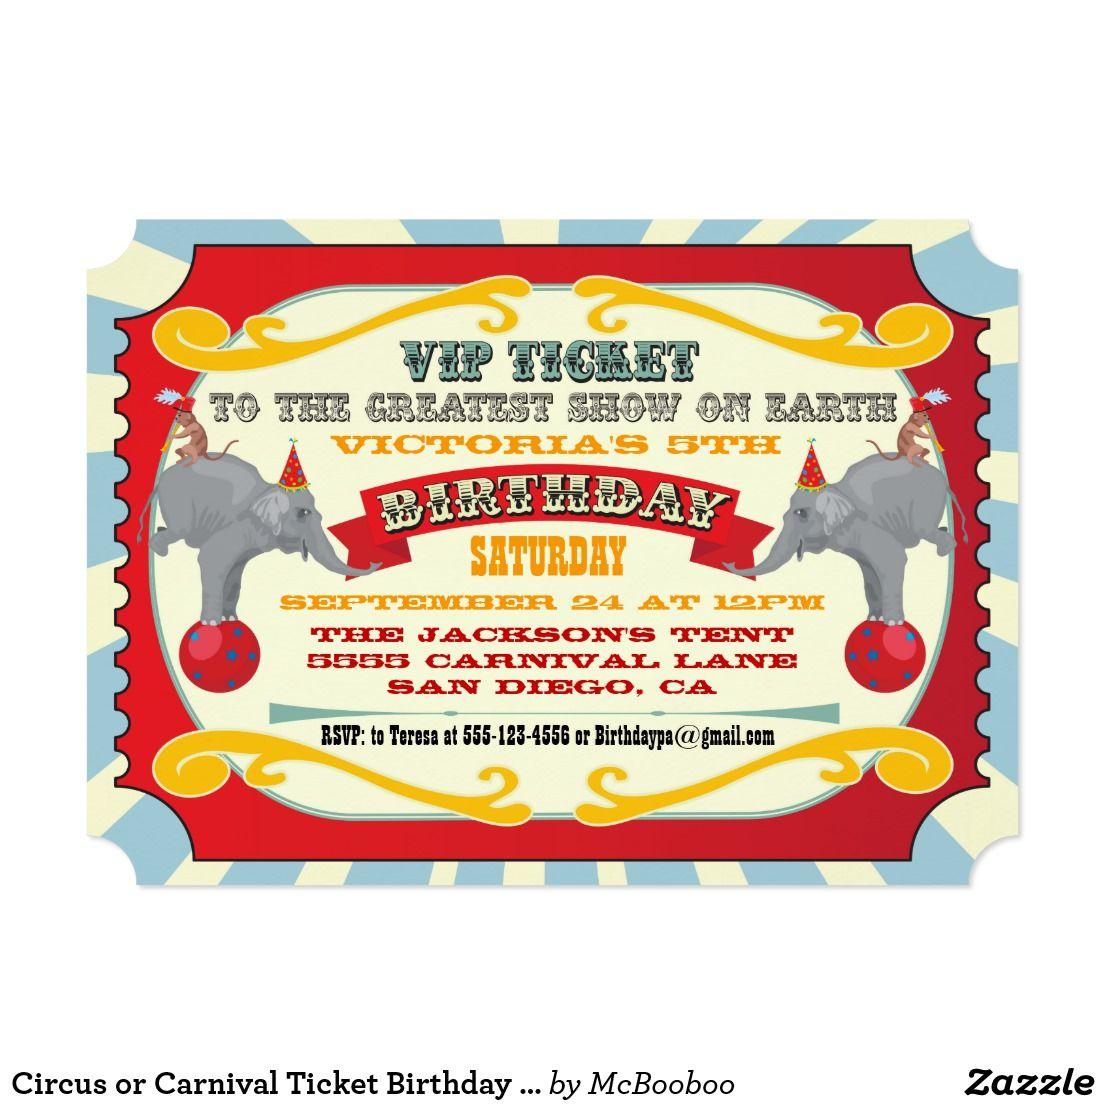 Circus or Carnival Ticket Birthday Invitation | Carnival tickets ...